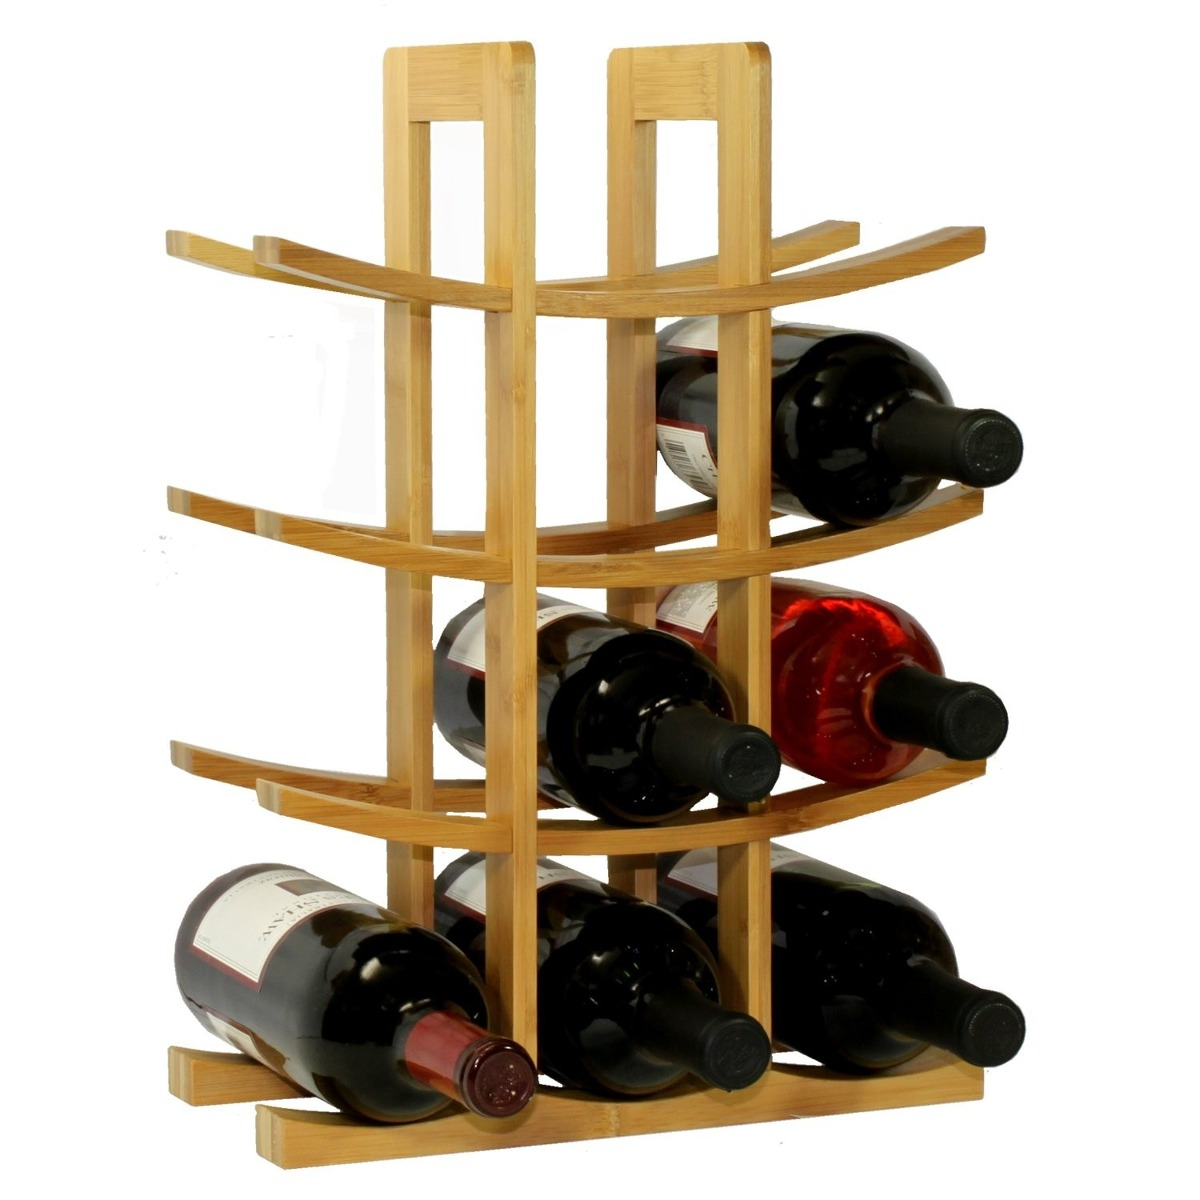 Cava De Madera Fina Porta 12 Botellas De Vino